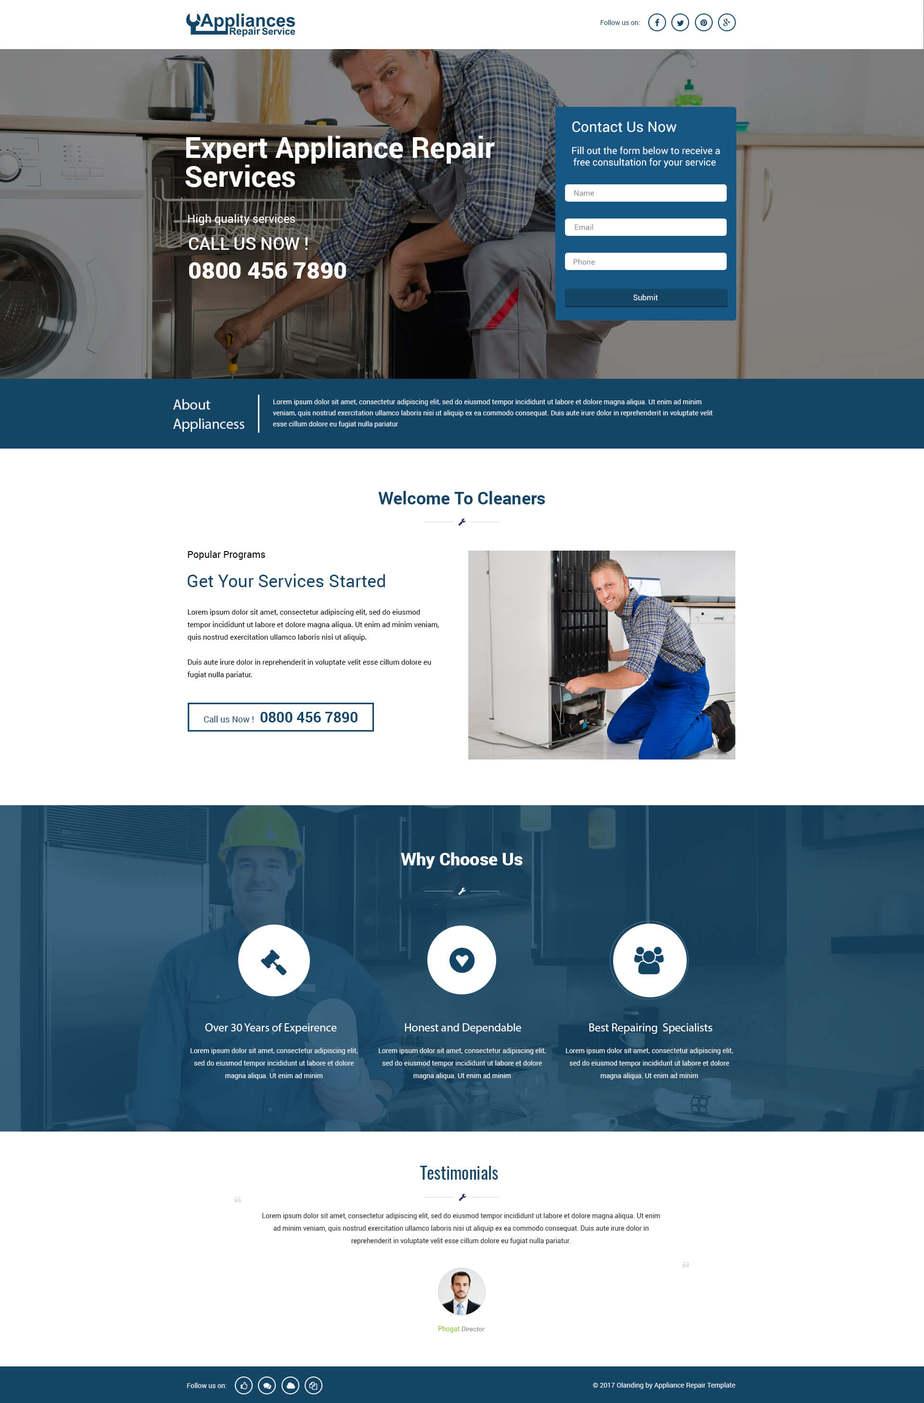 WordPress Landing Page Website,WordPress landing page,landing page example,Landing Page Website Design,free landing page,landing page design